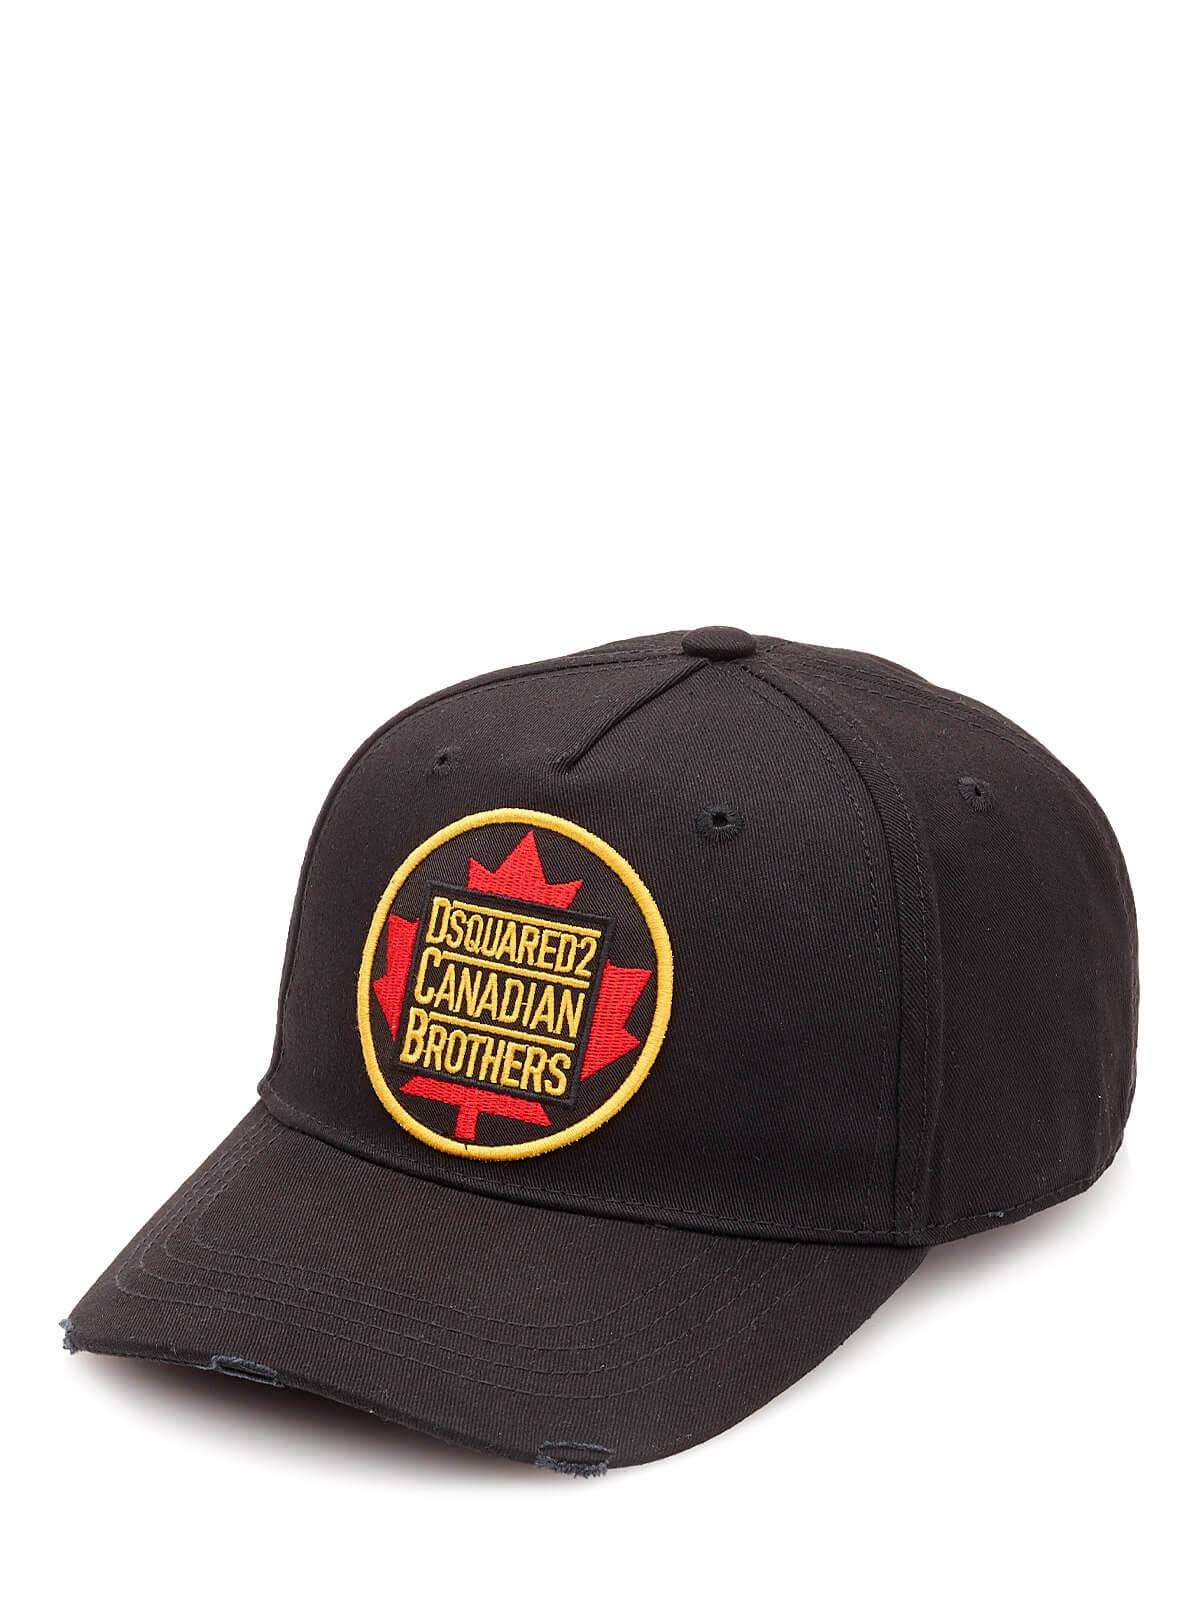 DSQUARED2 XXL Rot Mutze Cap Basecap Mütze D2 ONESIZE UNISEX